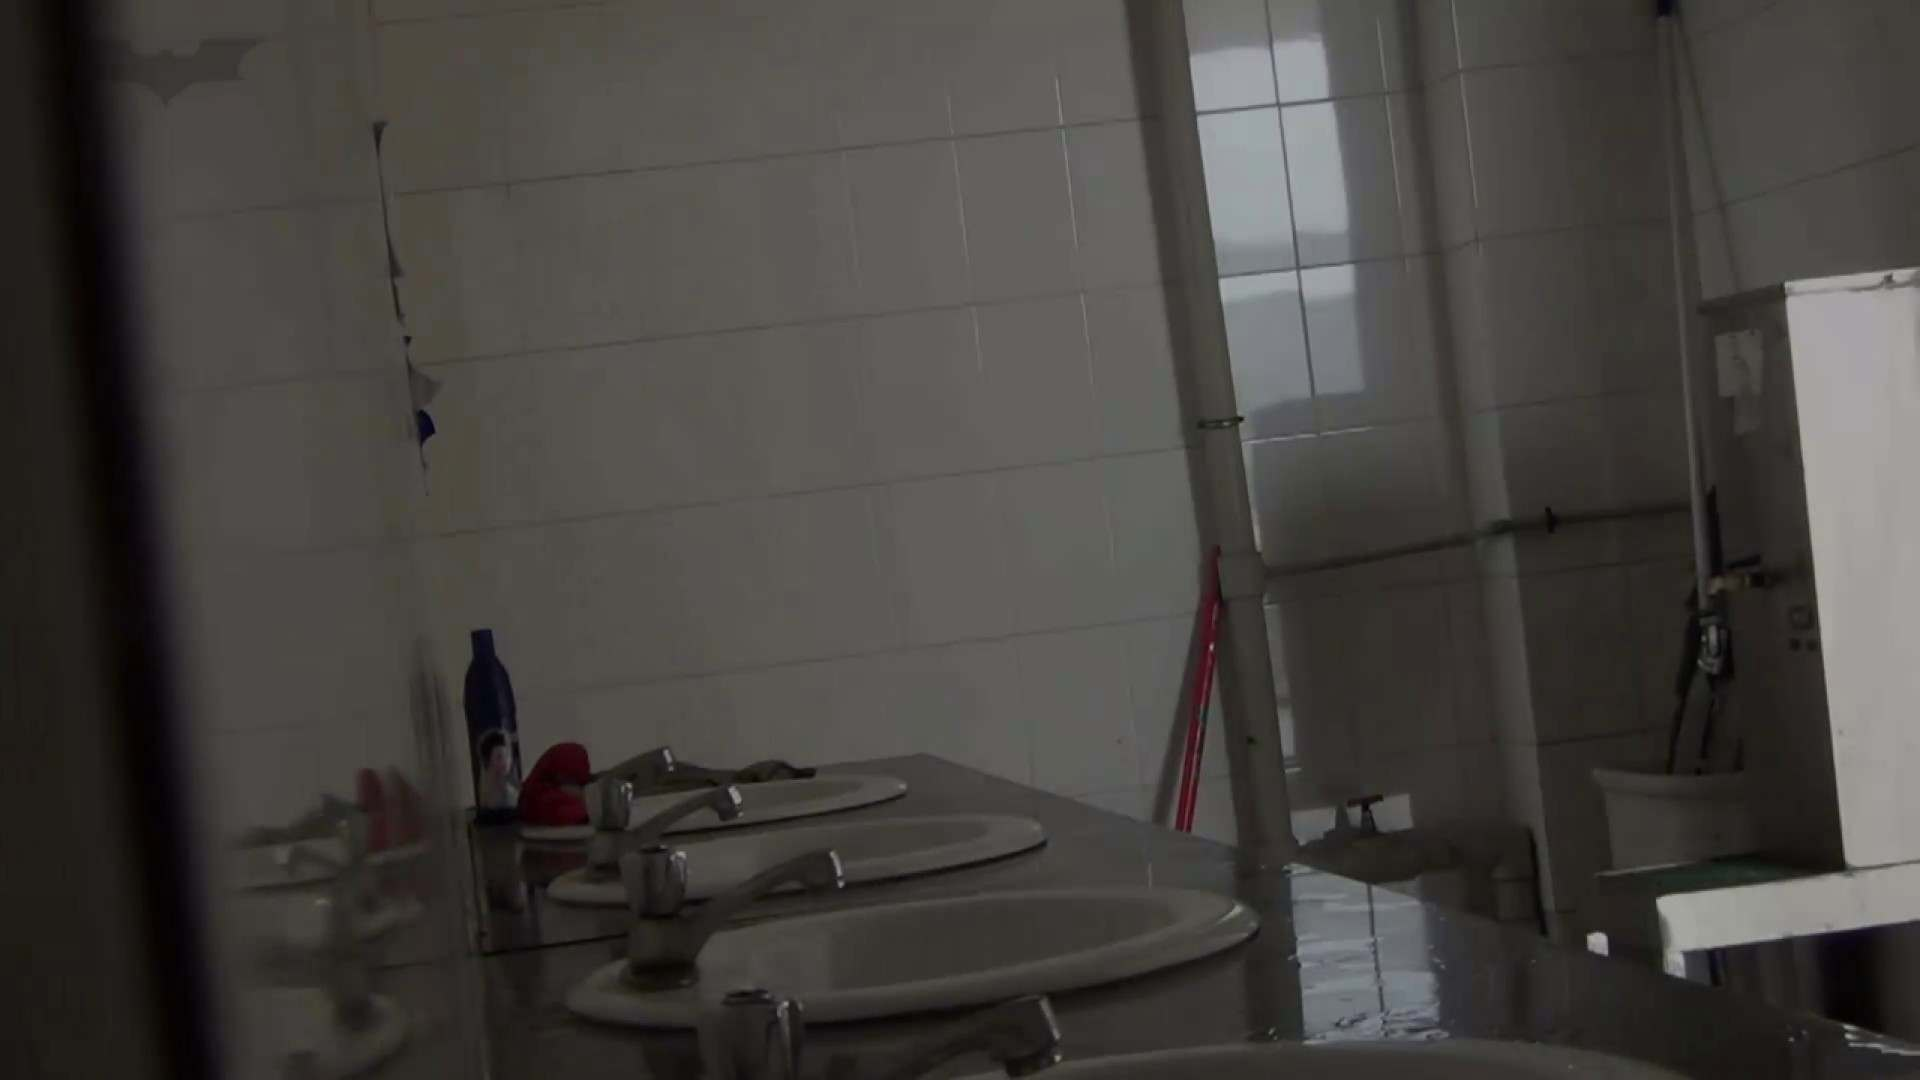 JD盗撮 美女の洗面所の秘密 Vol.36 盗撮編 セックス無修正動画無料 111枚 107